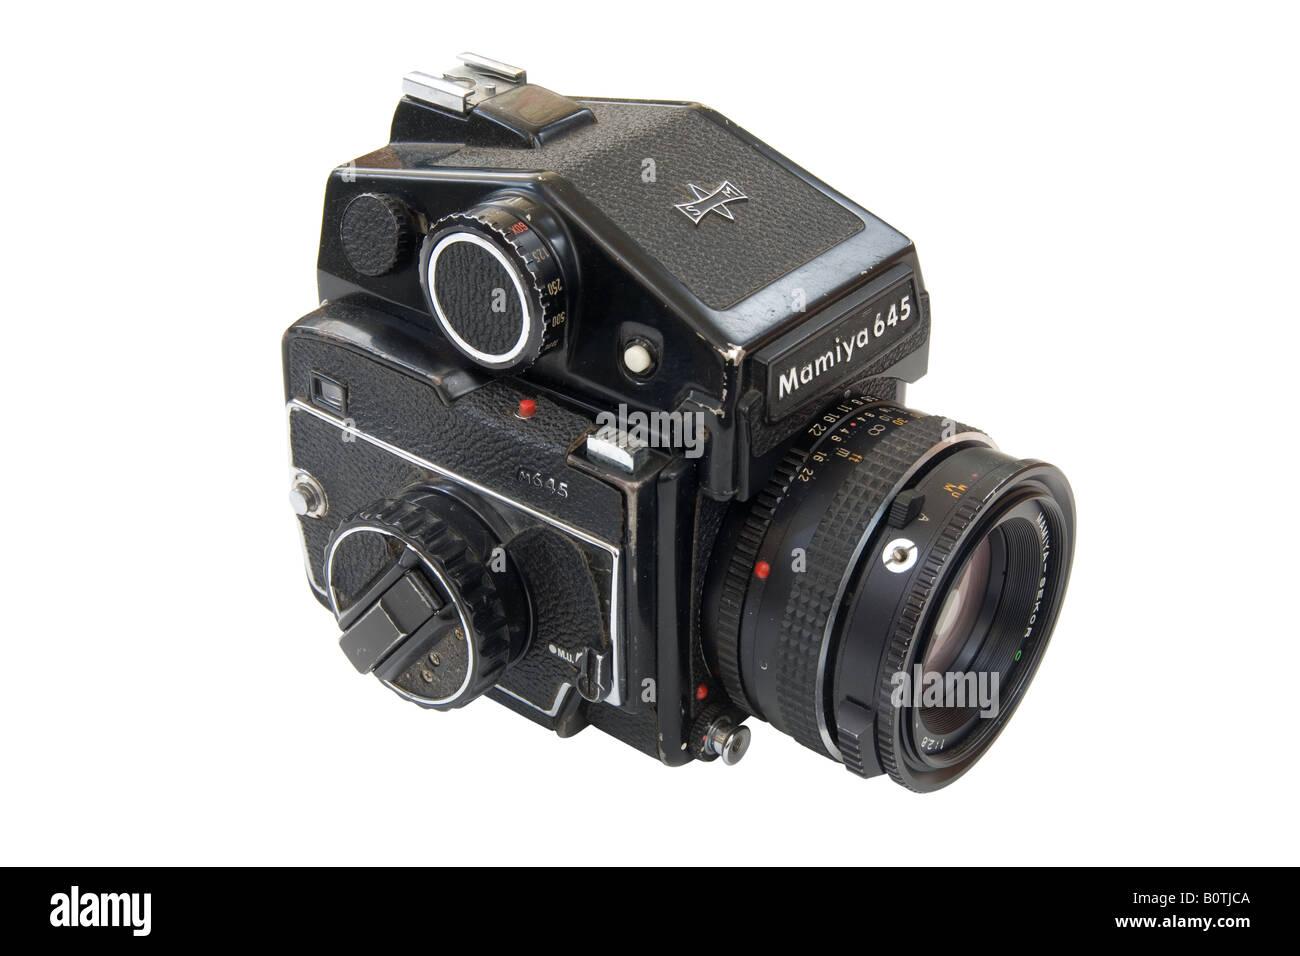 iconic Mamiya 645 medium format camera - Stock Image